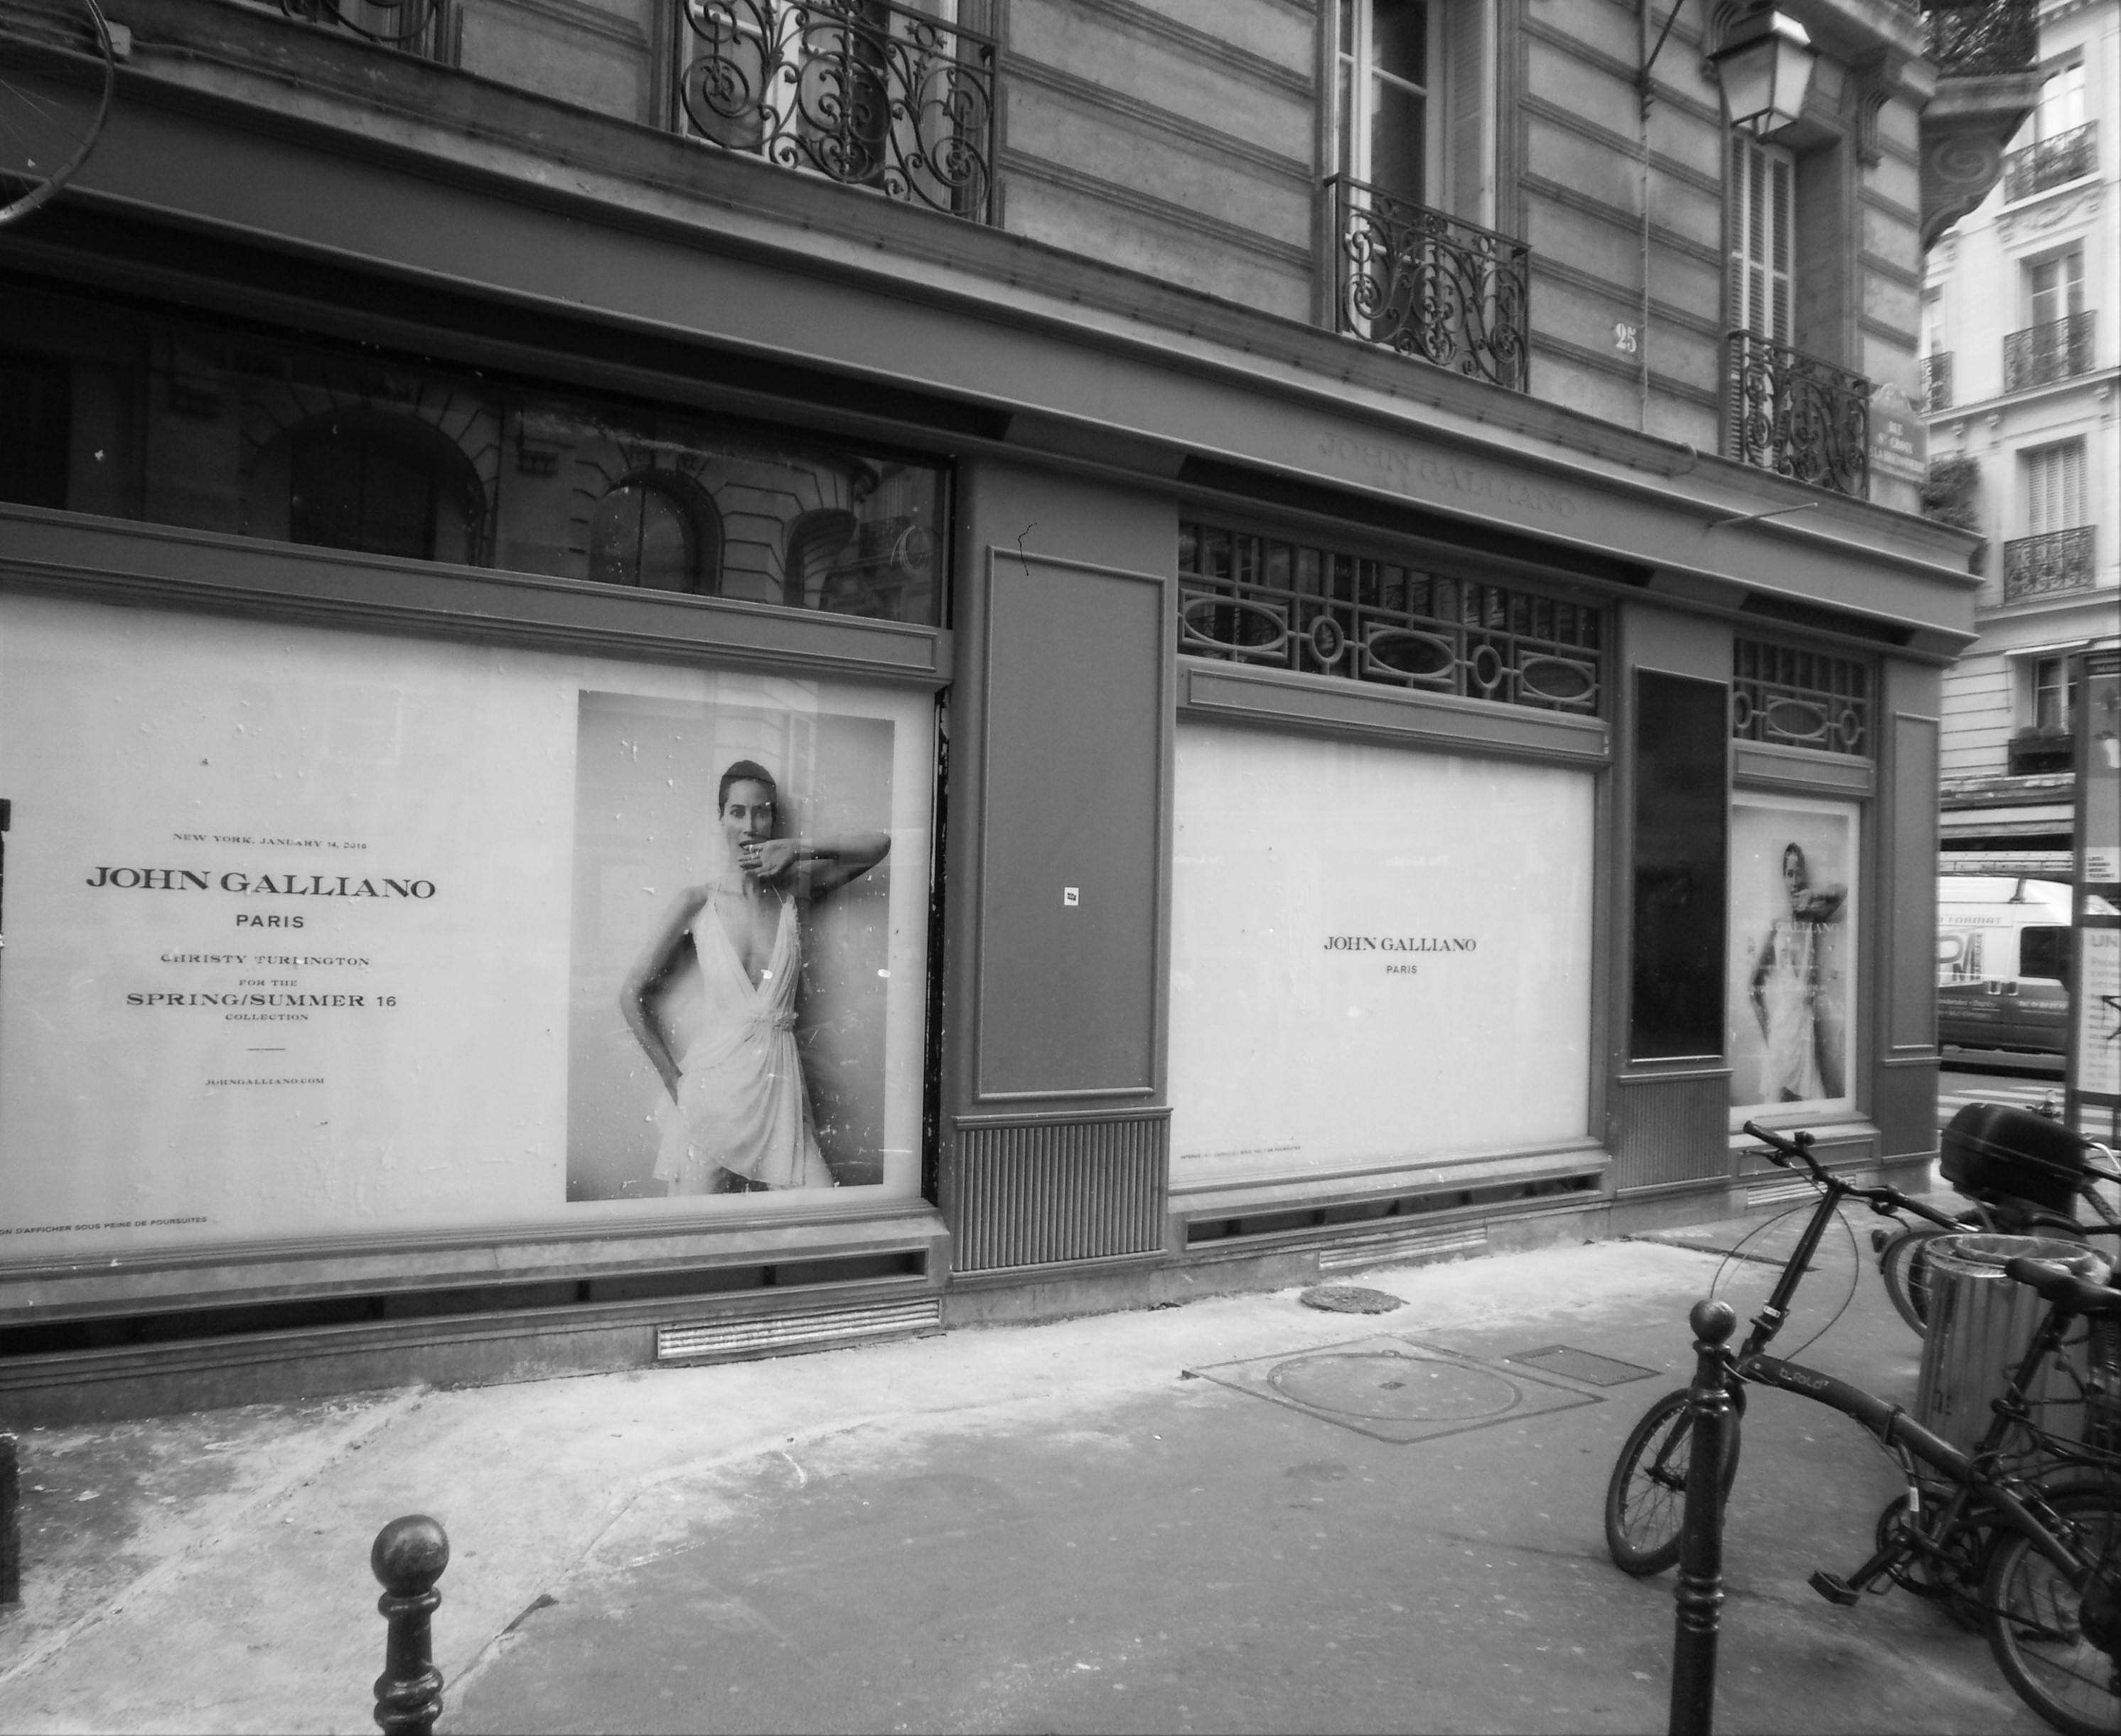 JOHN GALLIANO - PARIS